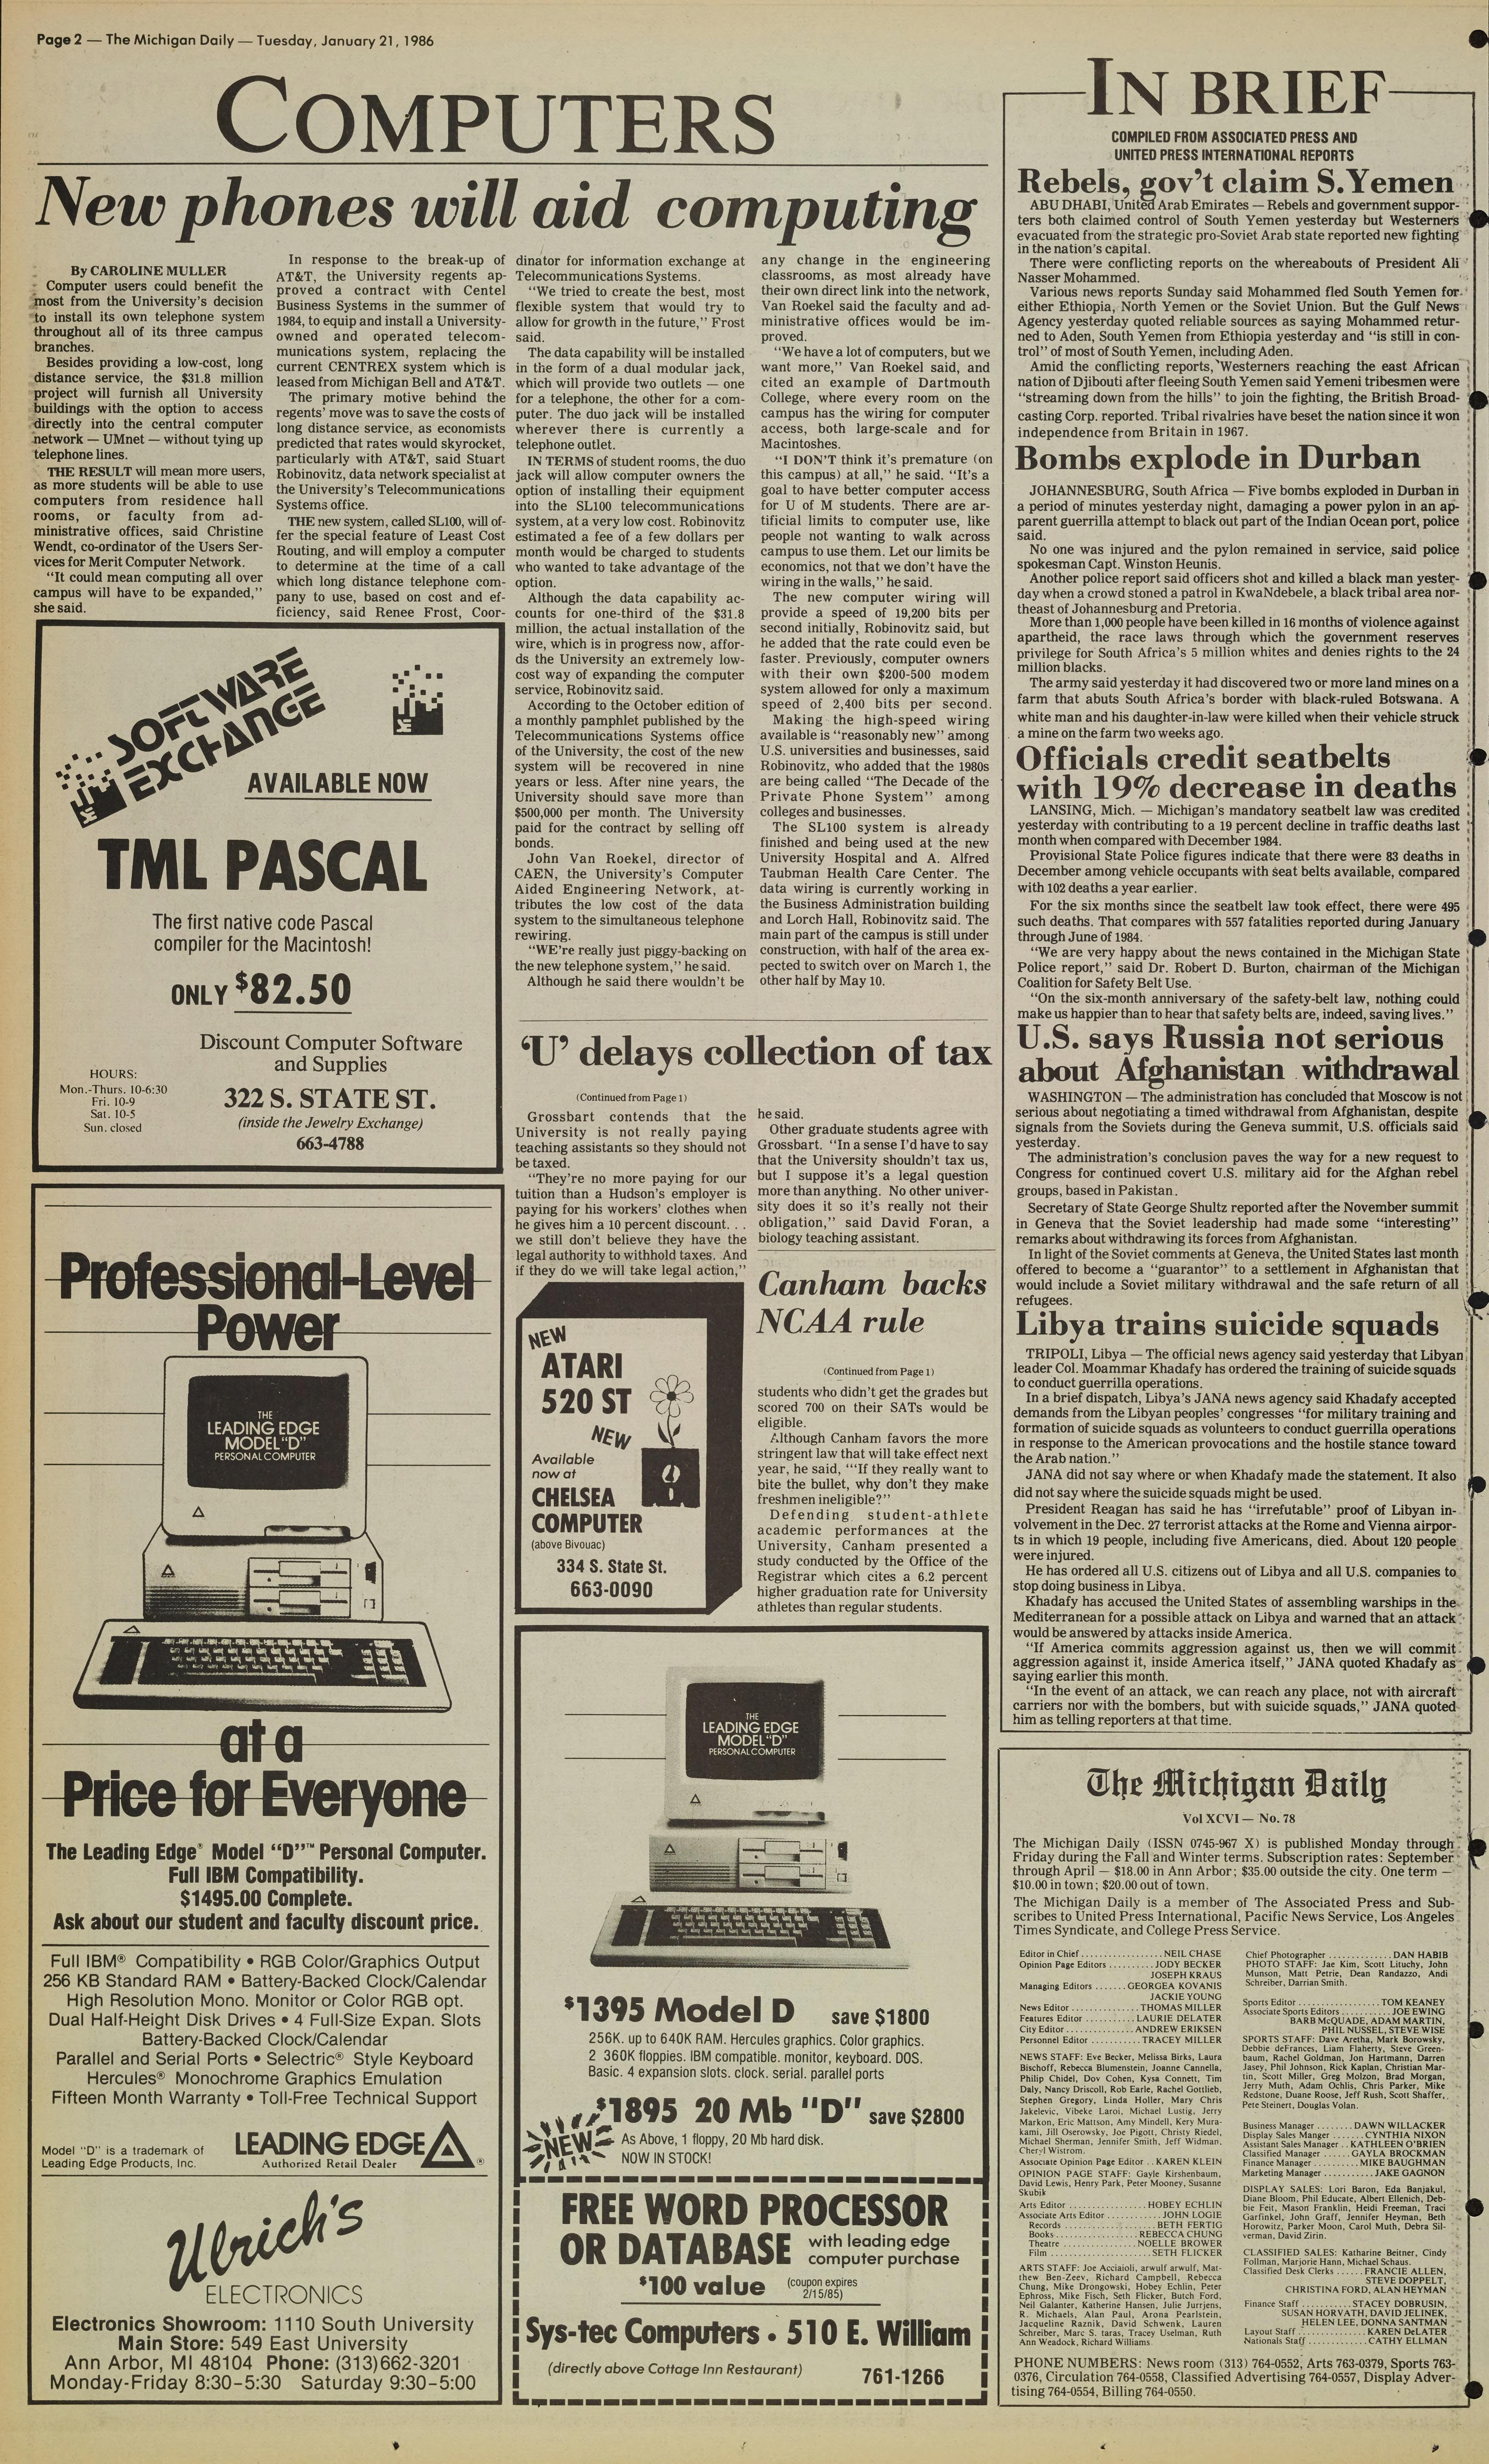 Michigan Daily Digital Archives - January 21, 1986 (vol  96